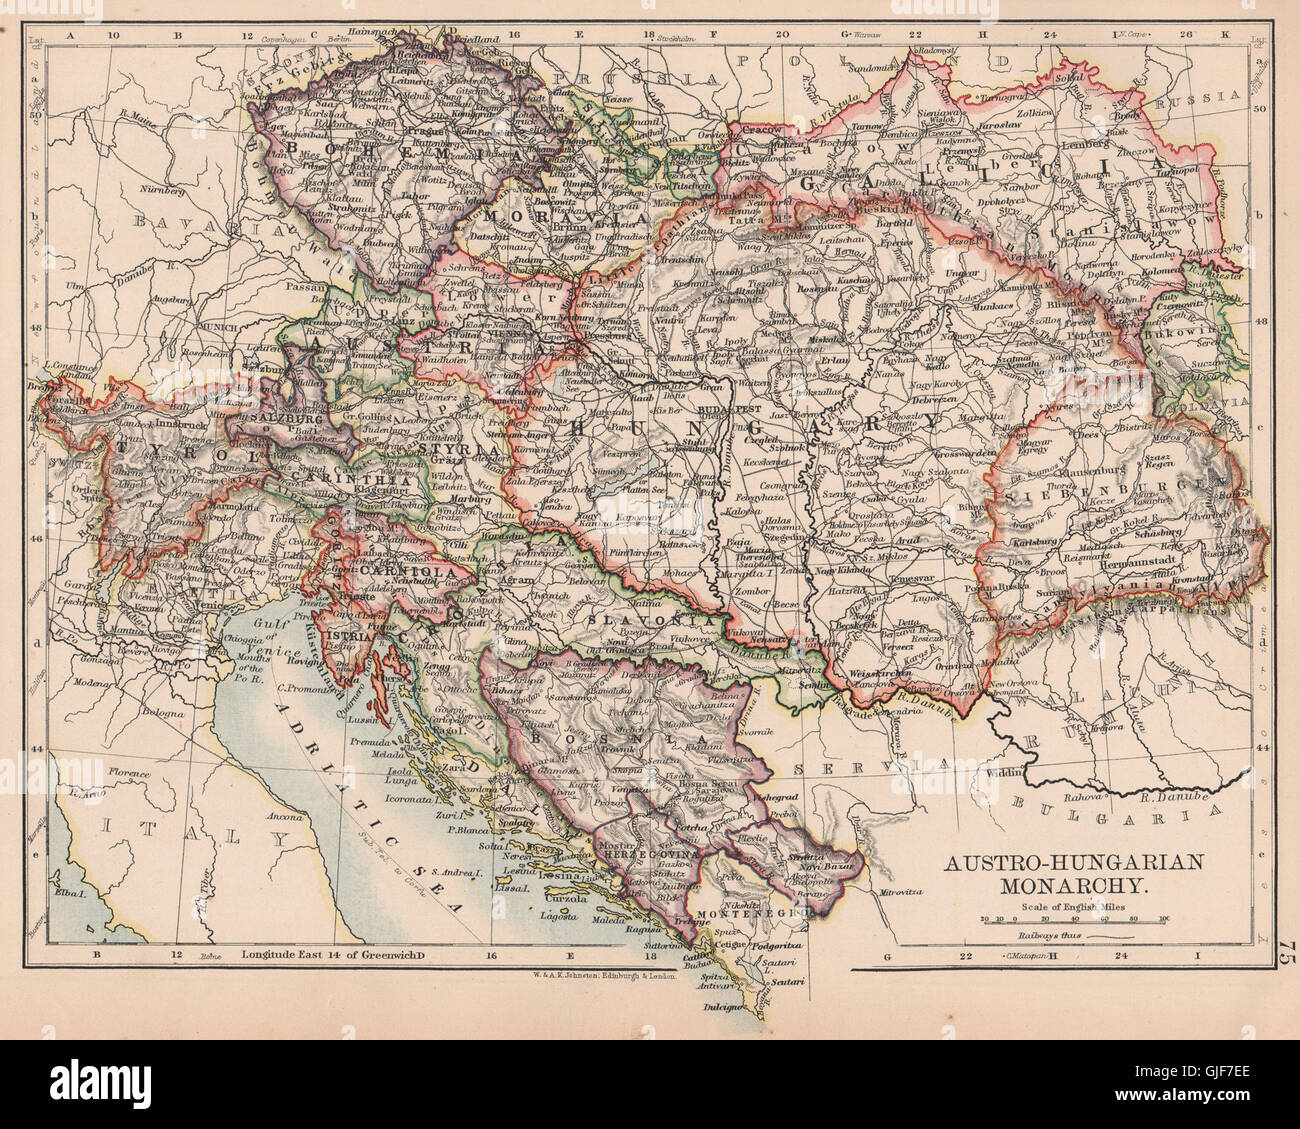 AUSTRO-HUNGARIAN MONARCHY. Dalmatia Slavonia Siebenburgen &c. JOHNSTON, 1906 map - Stock Image